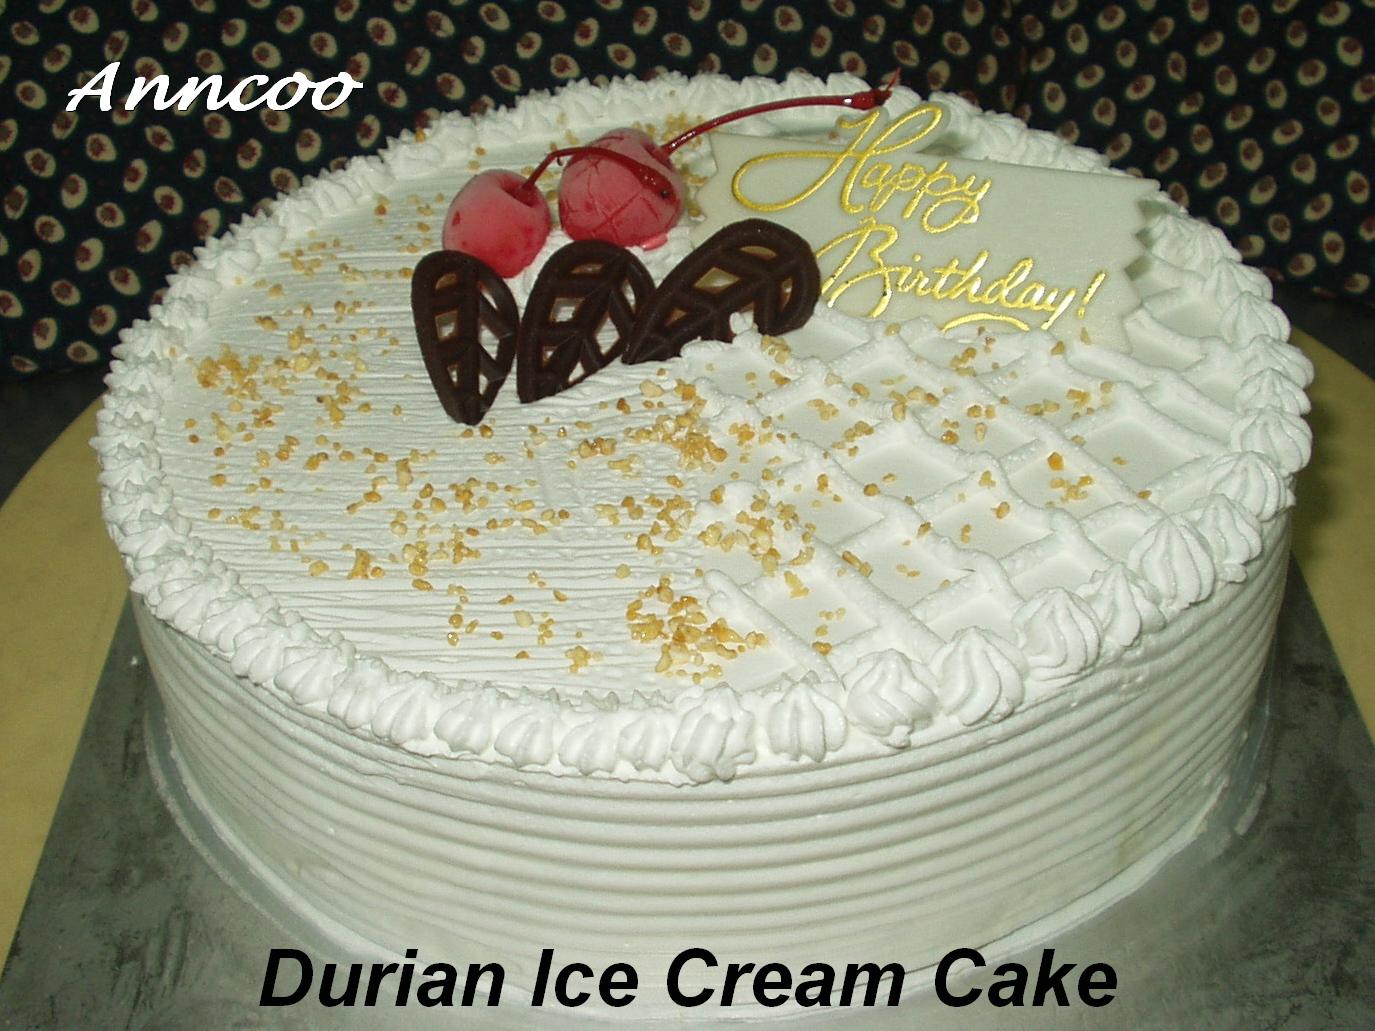 Dashing Dish Ice Cream Birthday Cake Recipes — Dishmaps